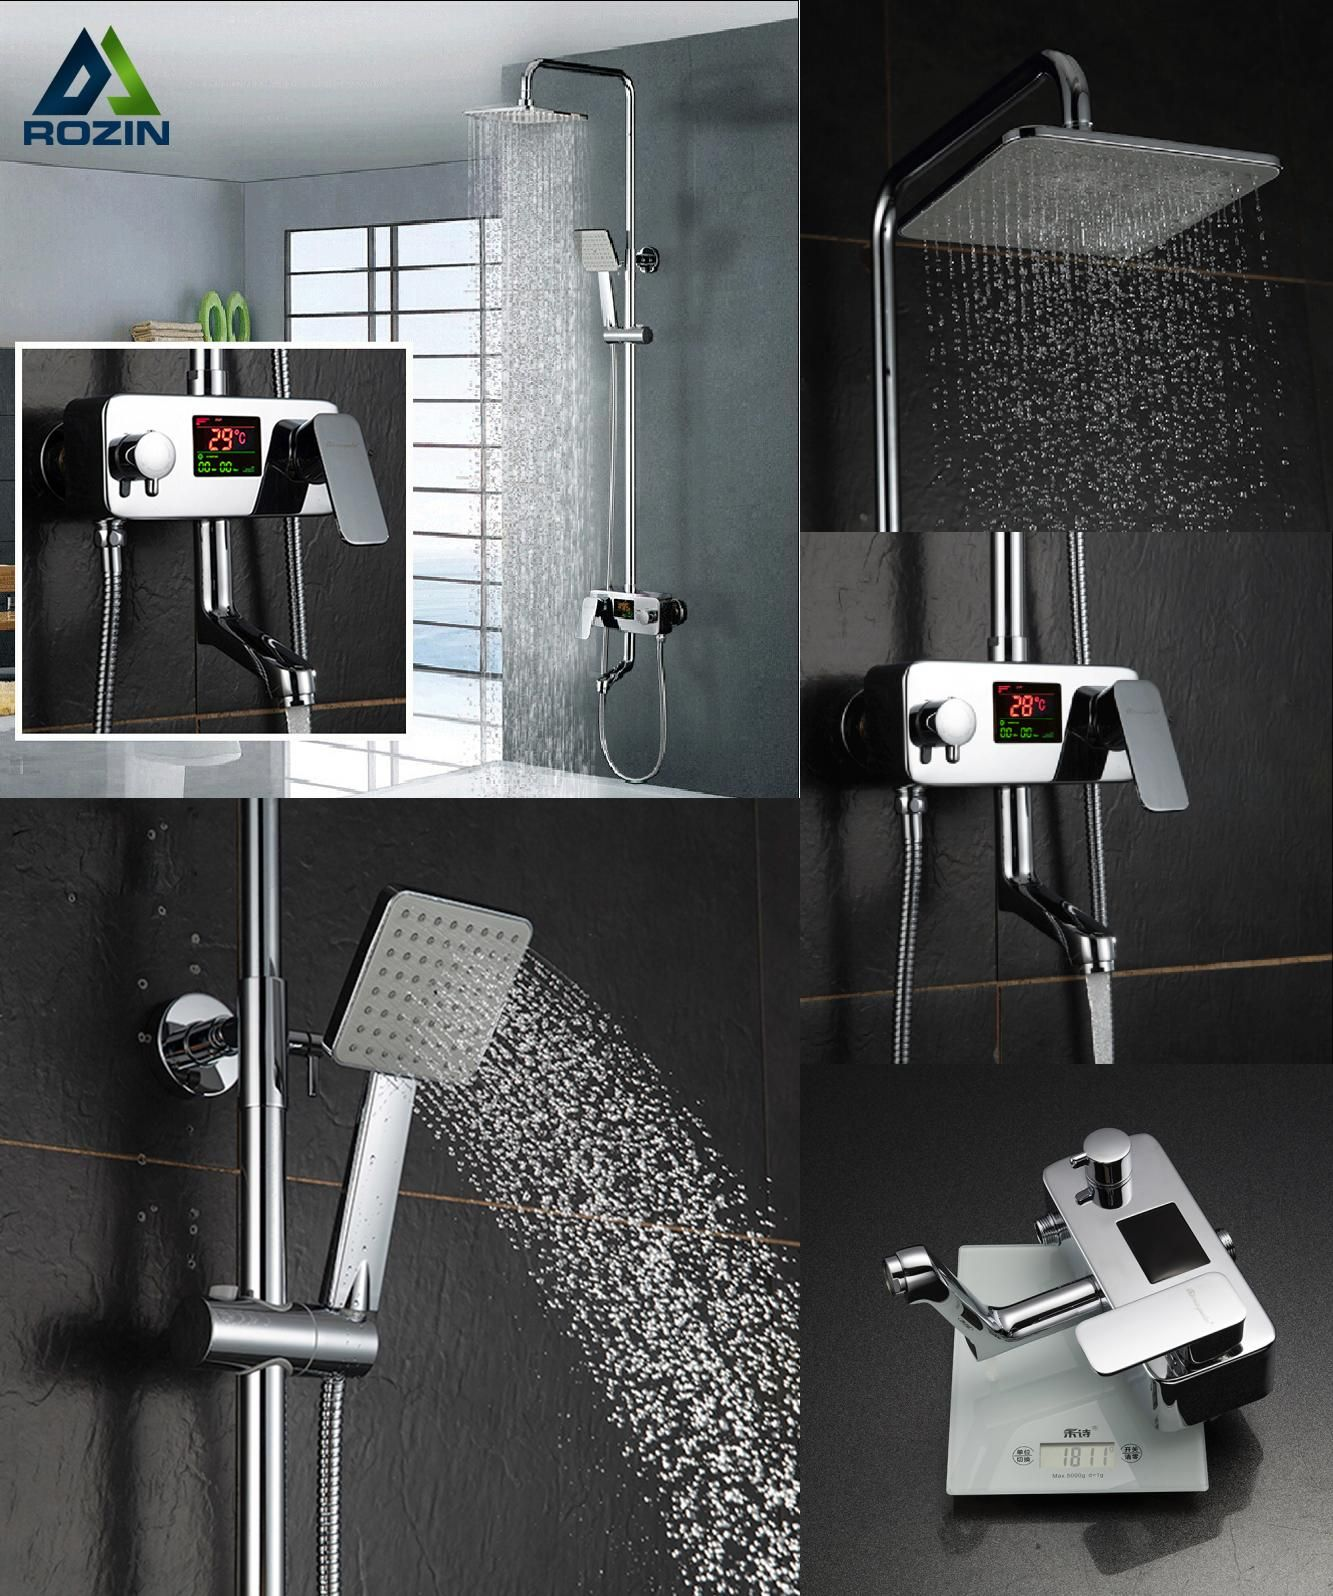 Visit to Buy] Digital Display Shower Faucet Water Powered Digital ...